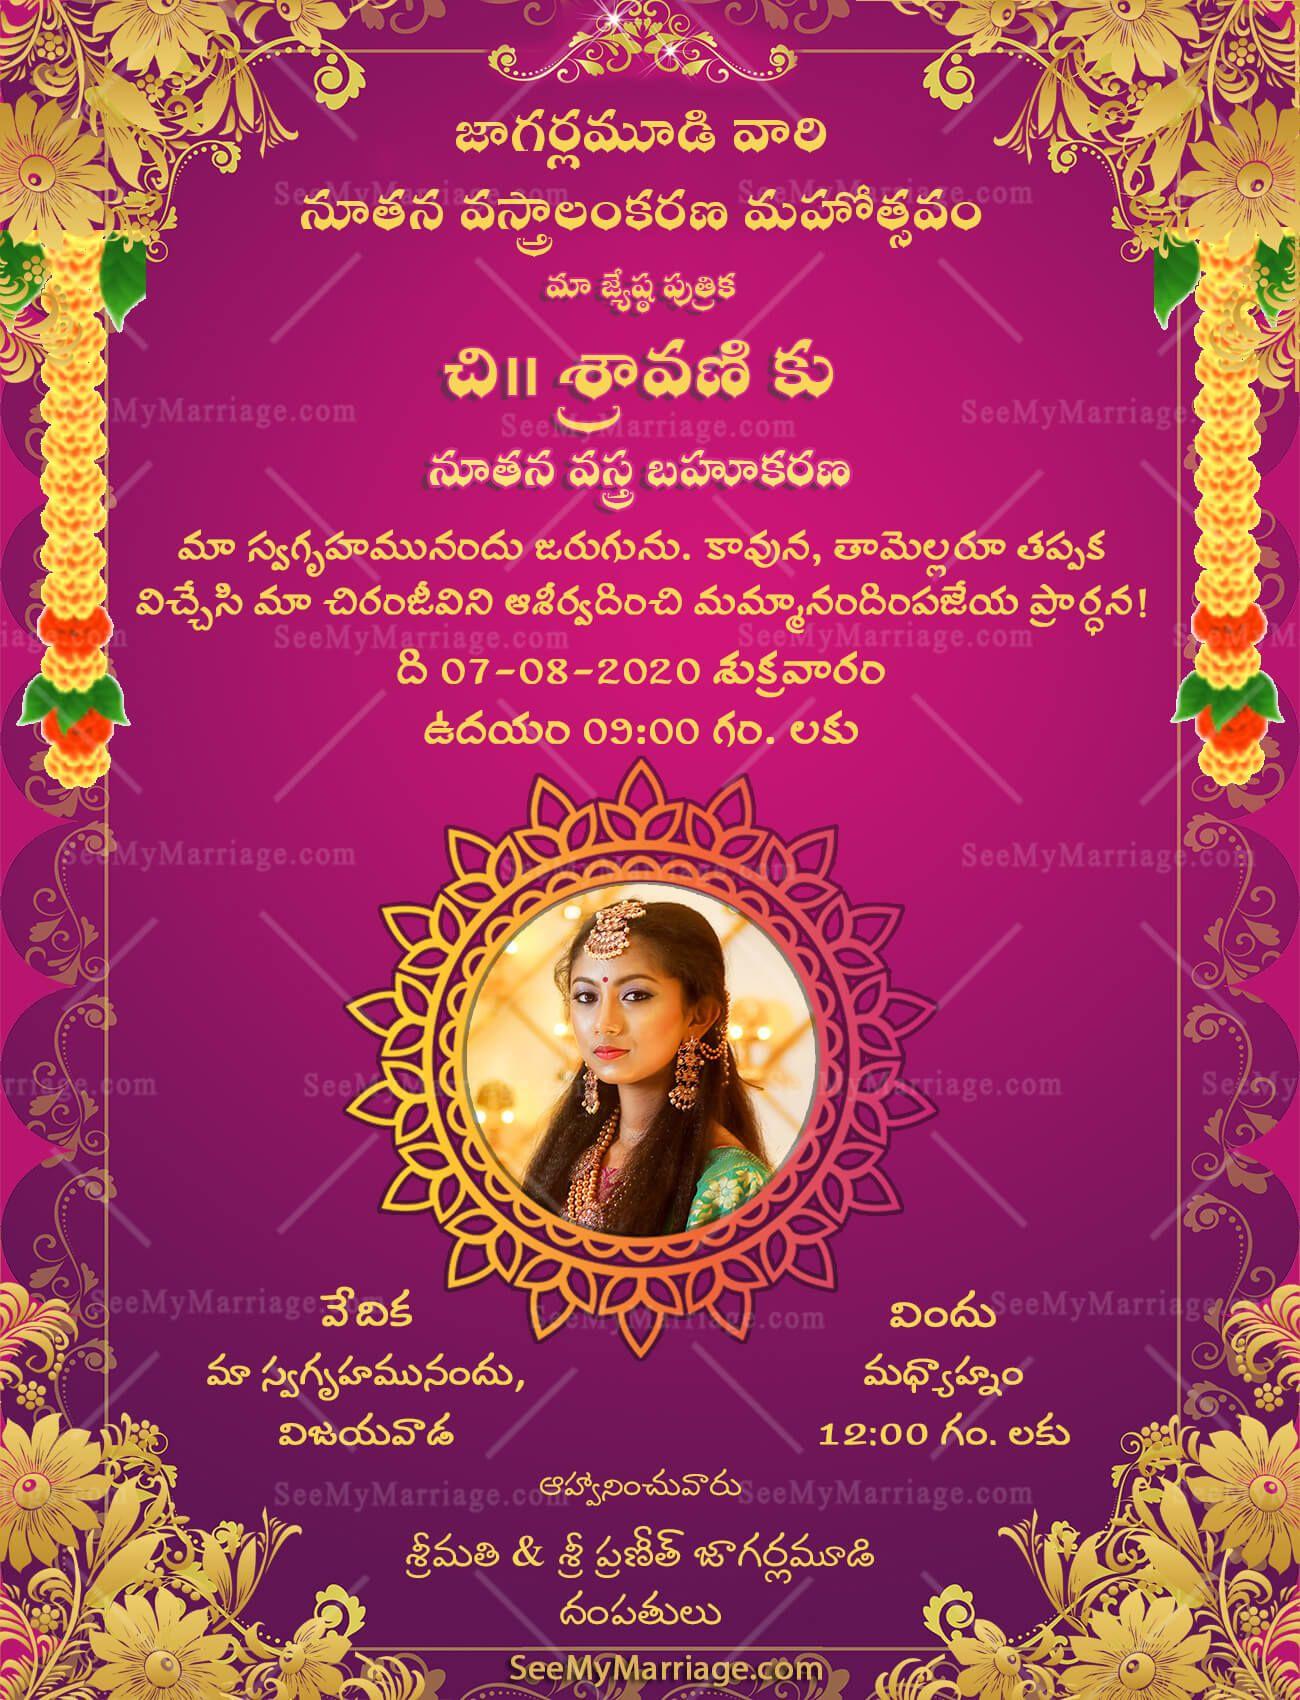 Half Saree Function Invitation In Telugu Nuthana Vastralankarana Mahotsavam Half Saree Half Saree Function Invitation Cards